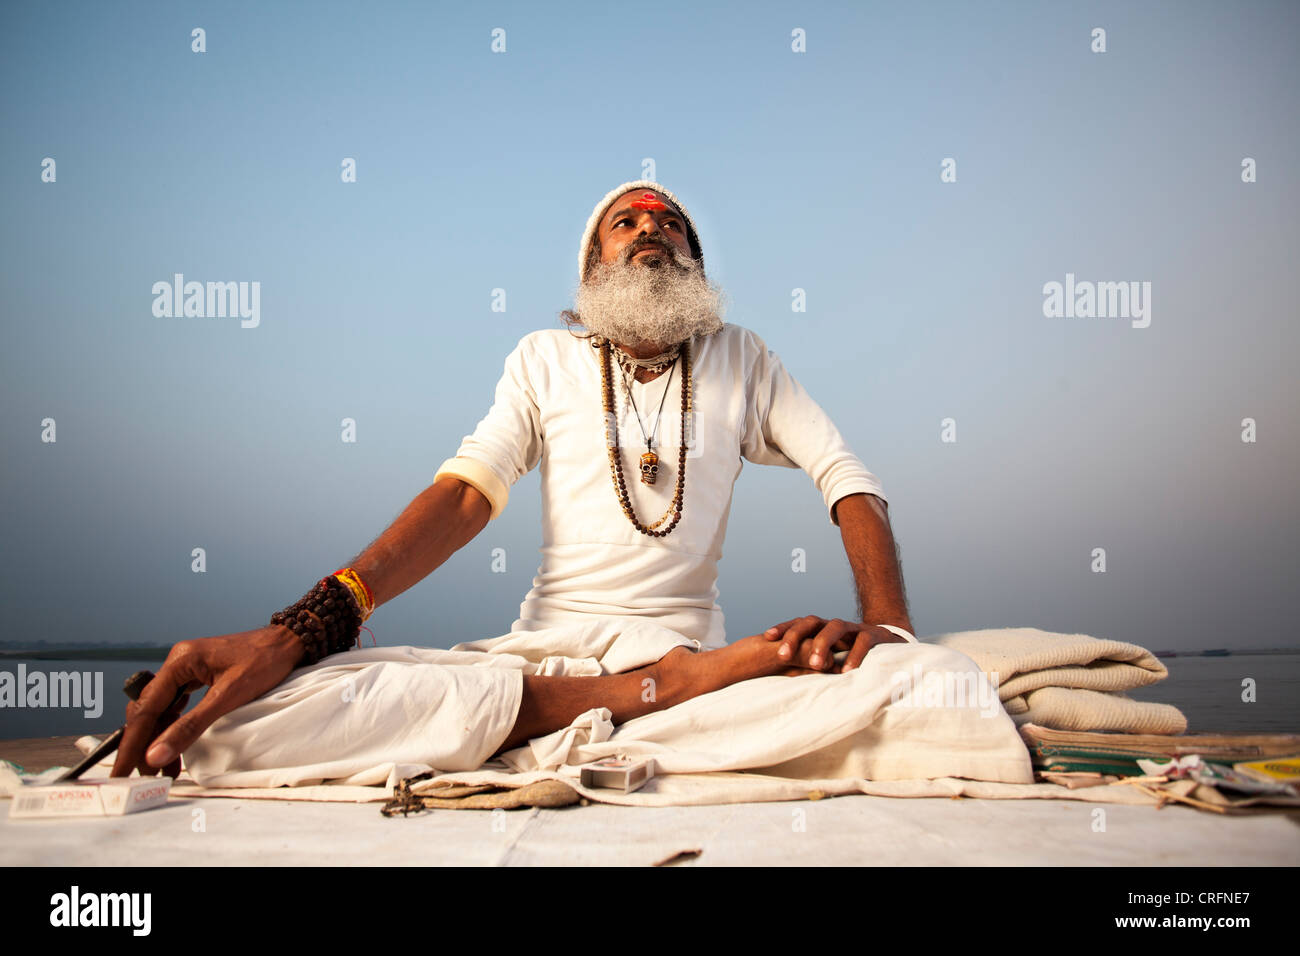 Hindu monk Sadhu(as holy man) sit on the Ghat in Varanasi, Uttar Pradesh, India - Stock Image